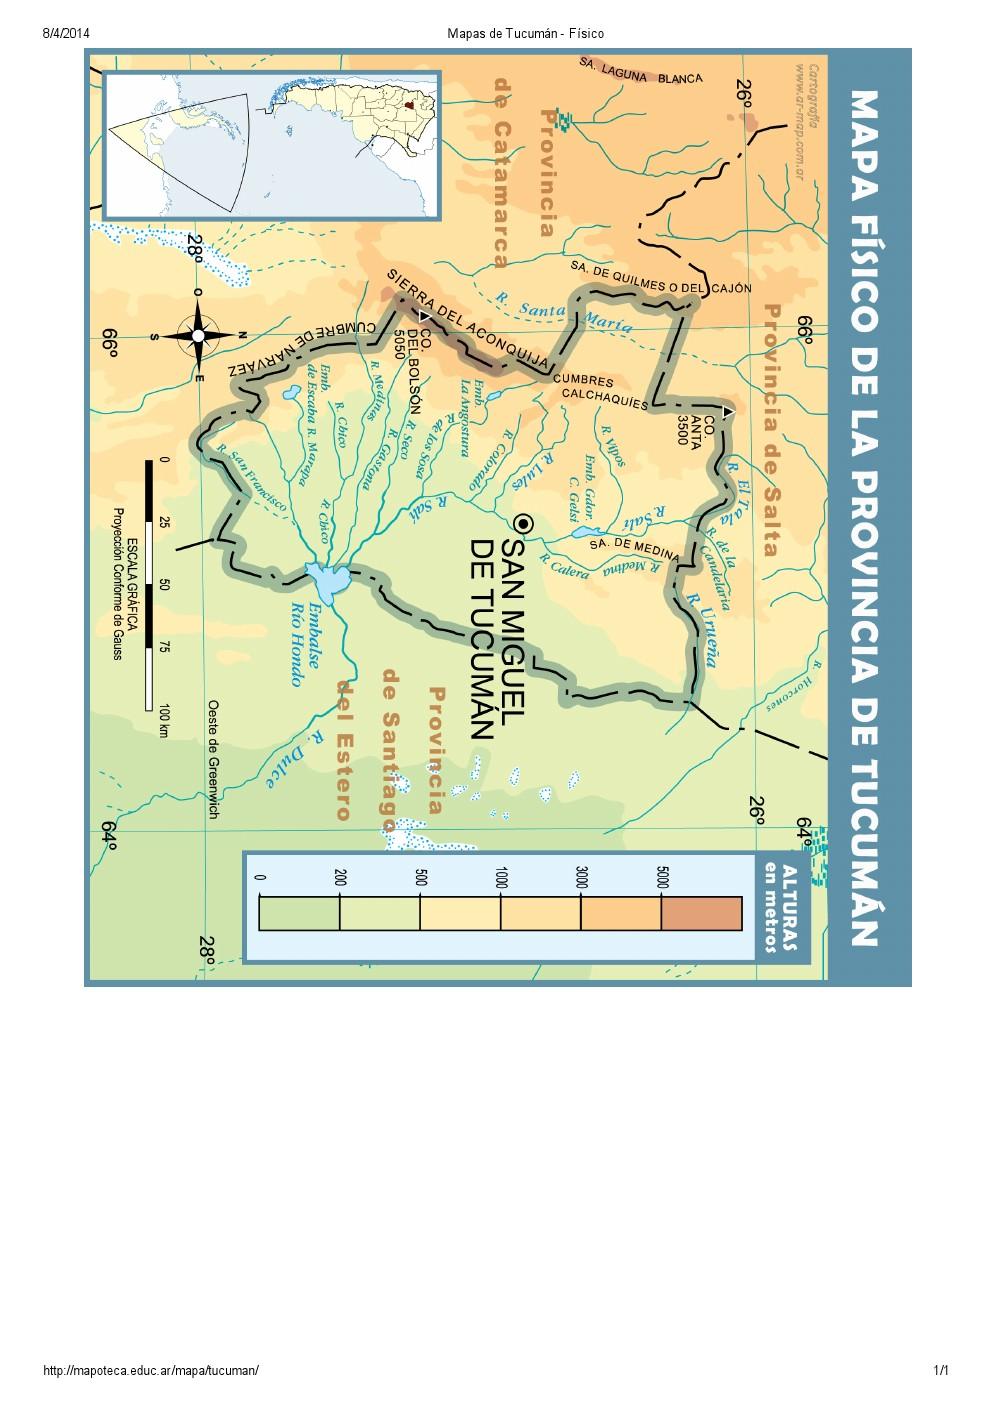 Mapa de ríos de Tucumán. Mapoteca de Educ.ar